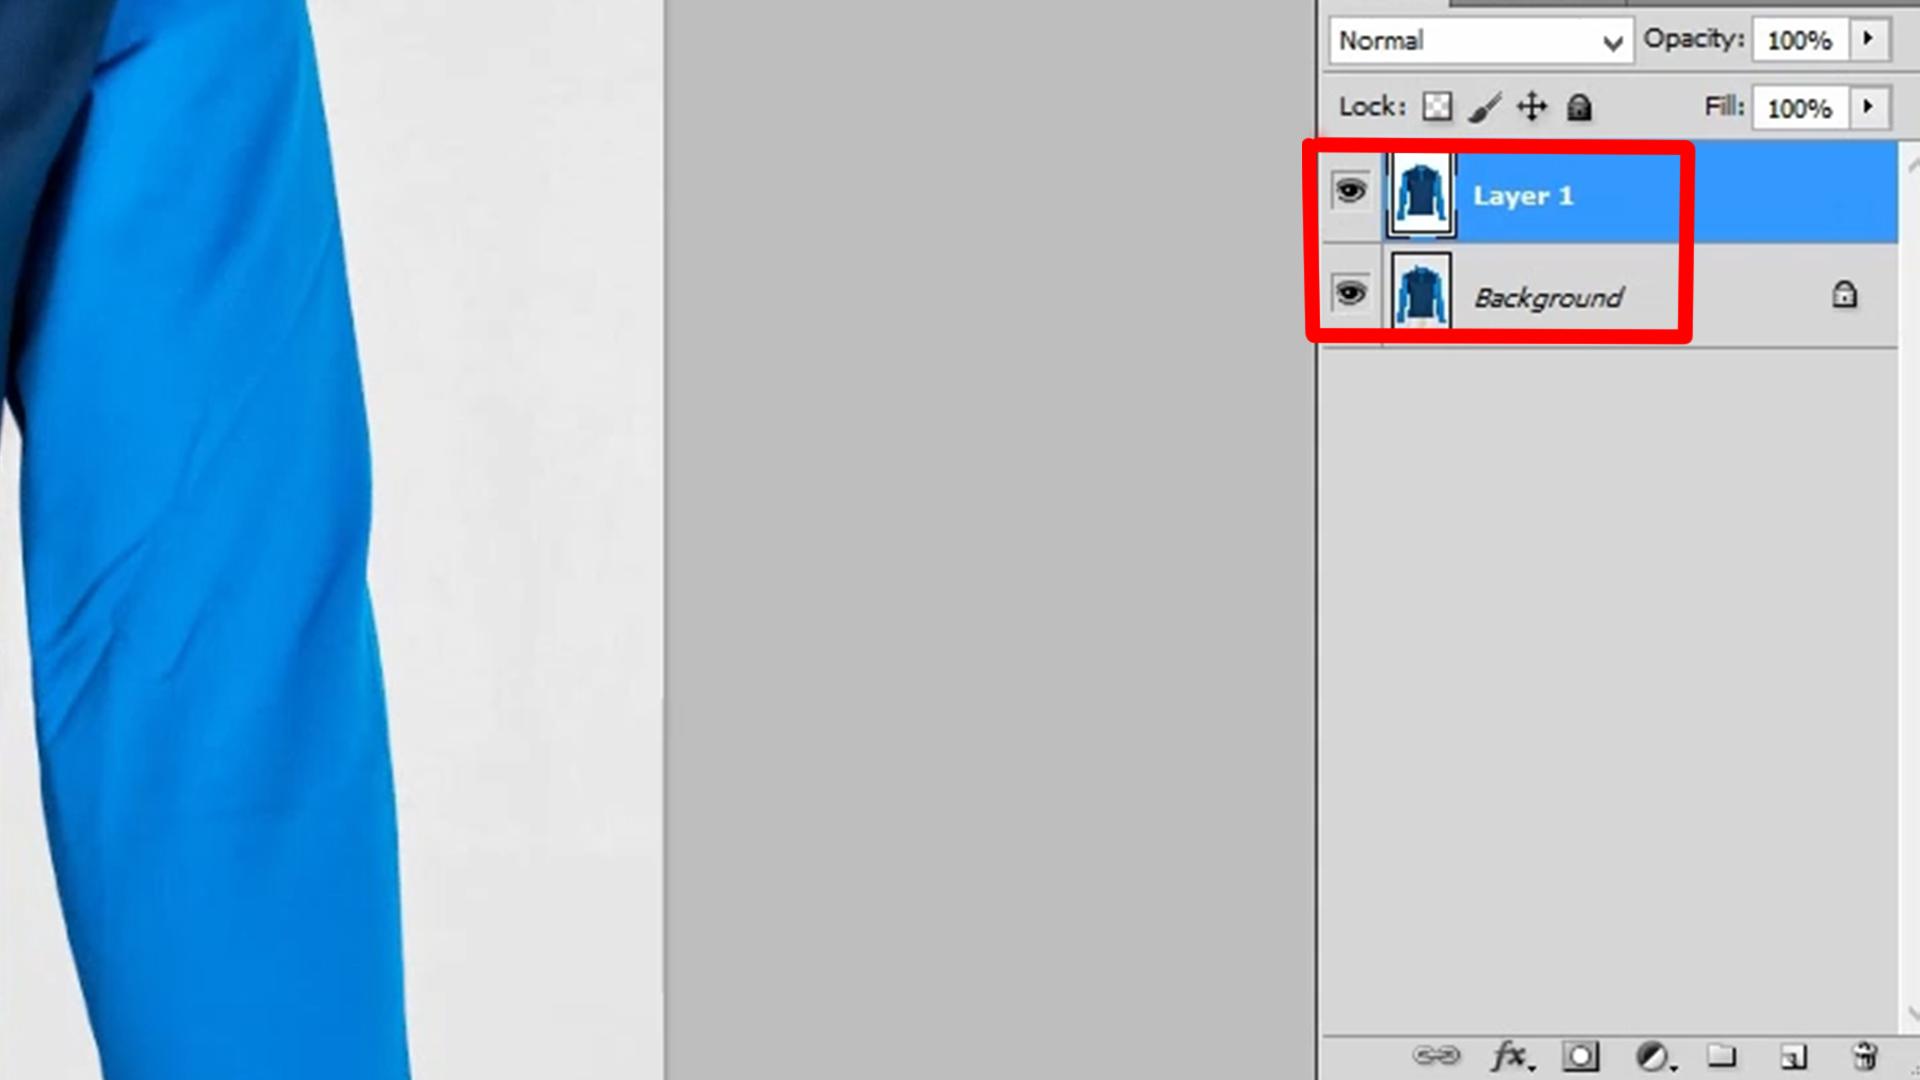 Press Ctrl + J to duplicate the layer